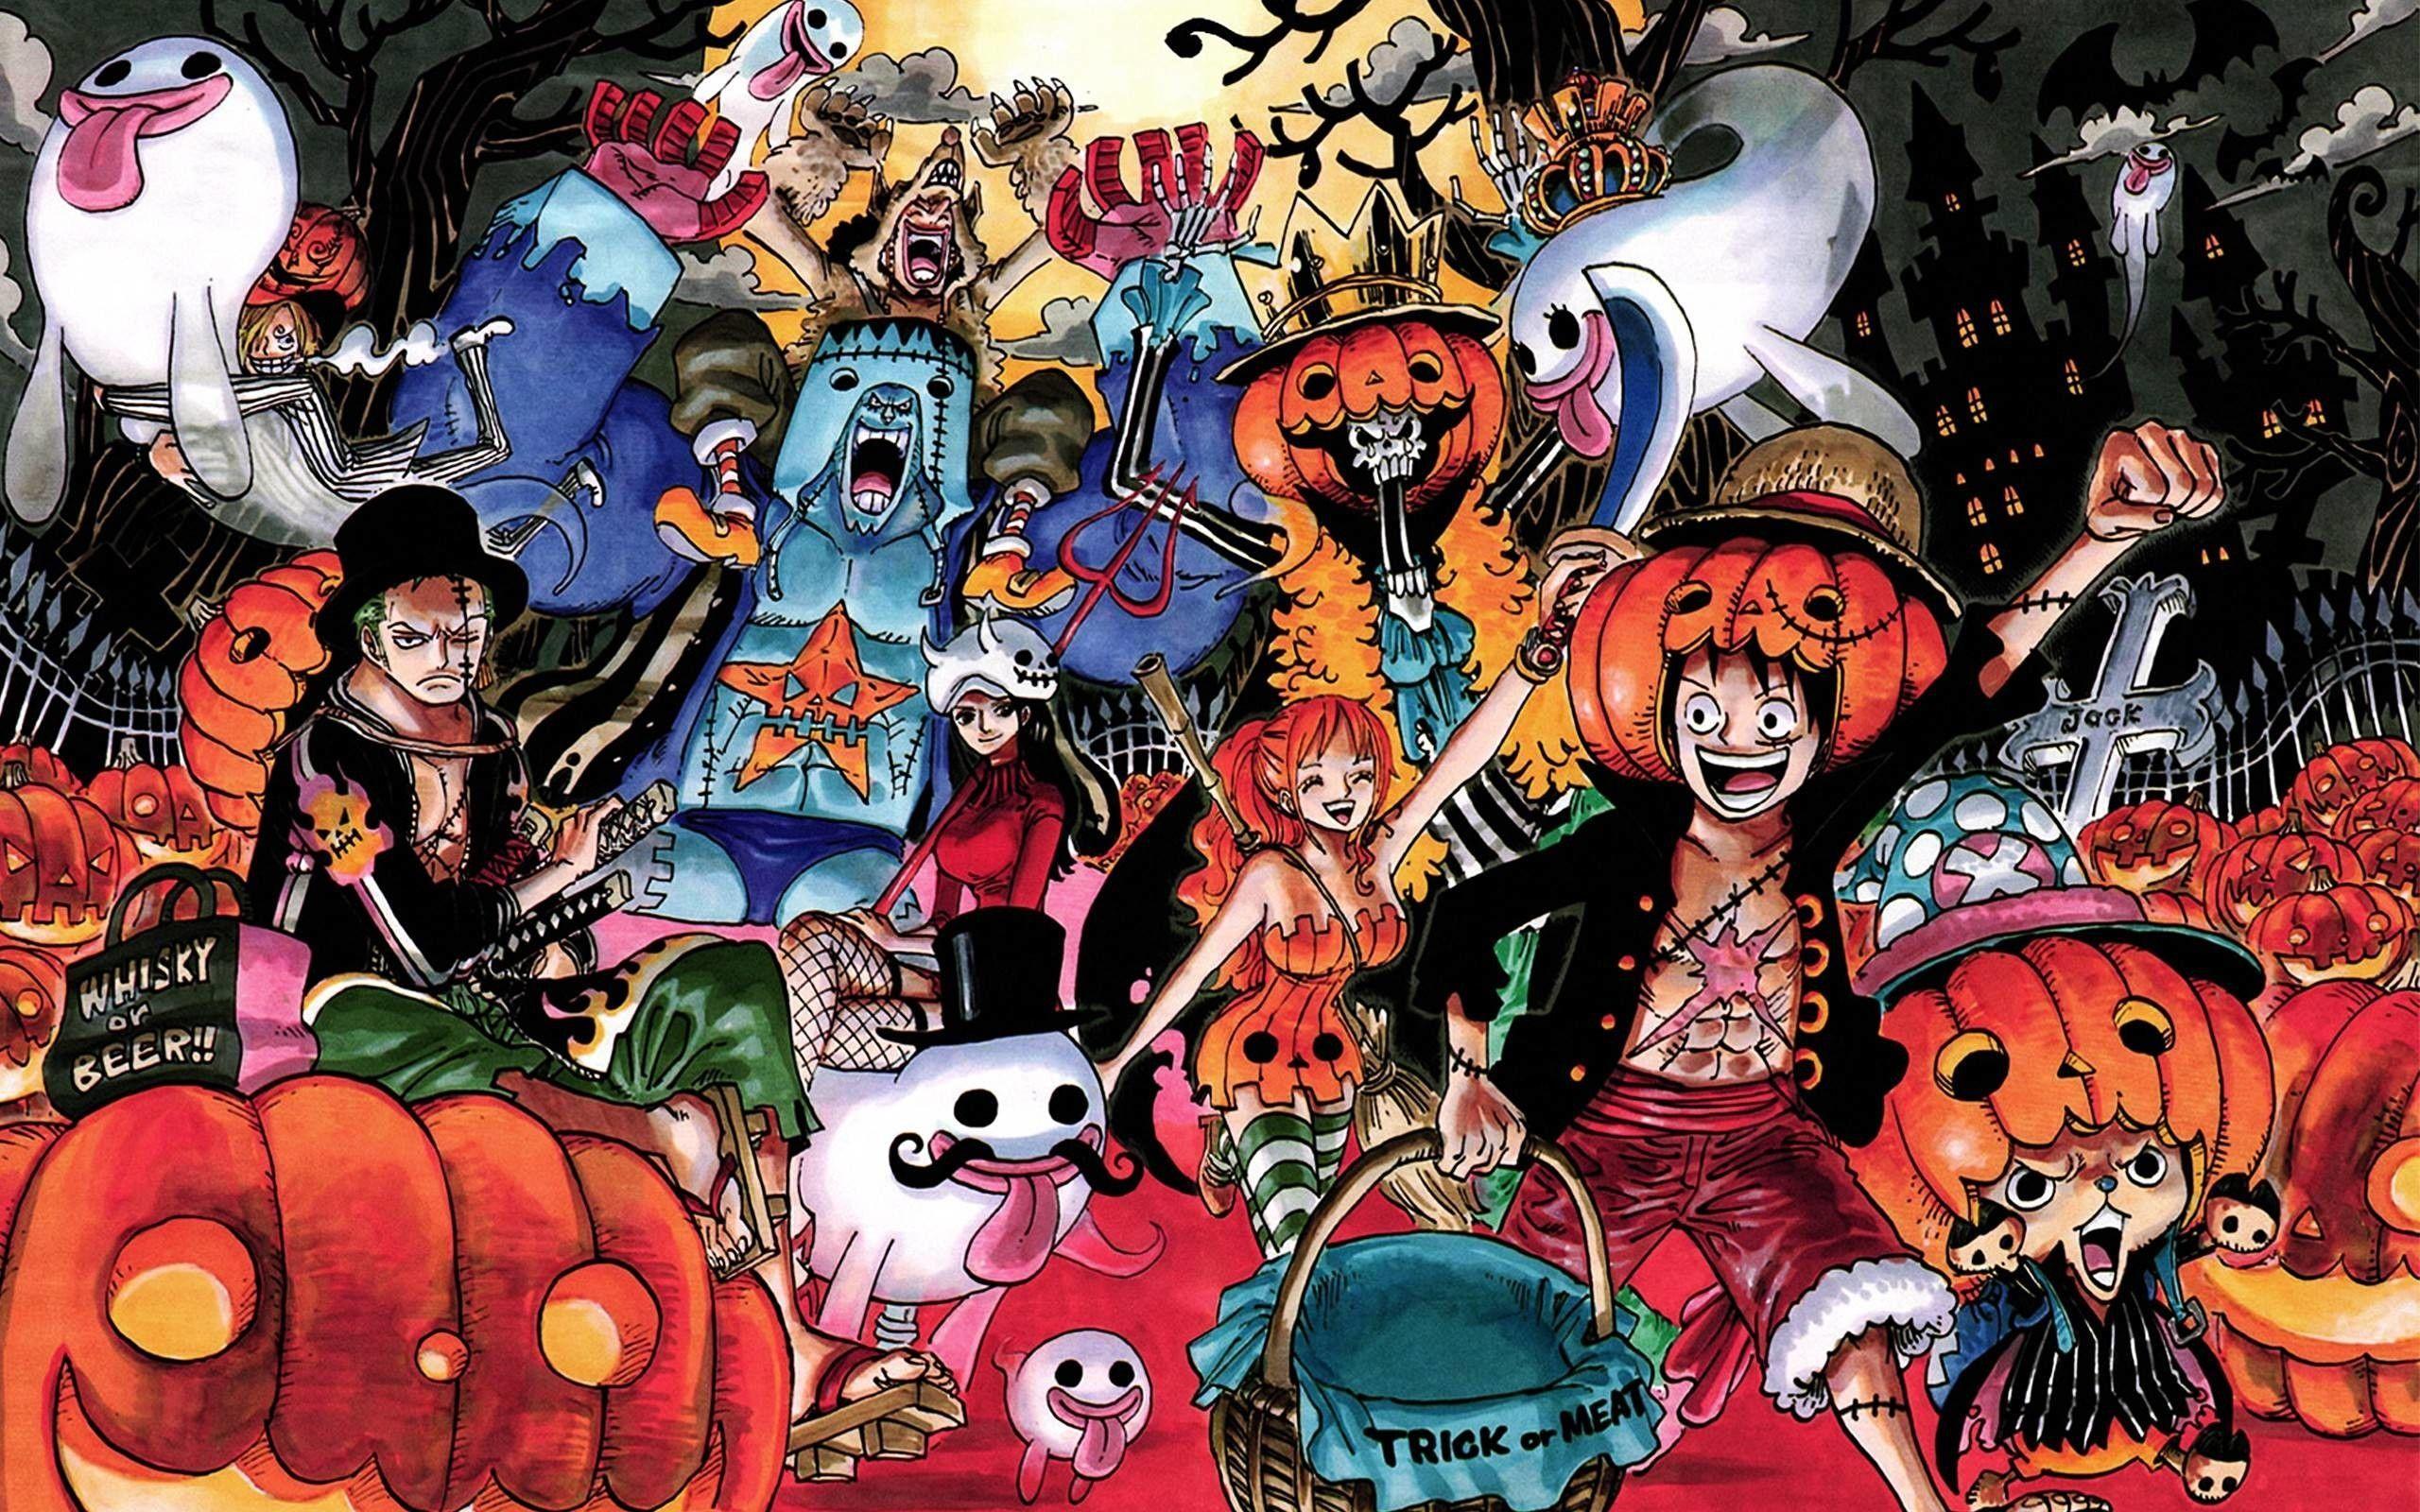 One Piece Wano HD Wallpapers - Top Free One Piece Wano HD ...